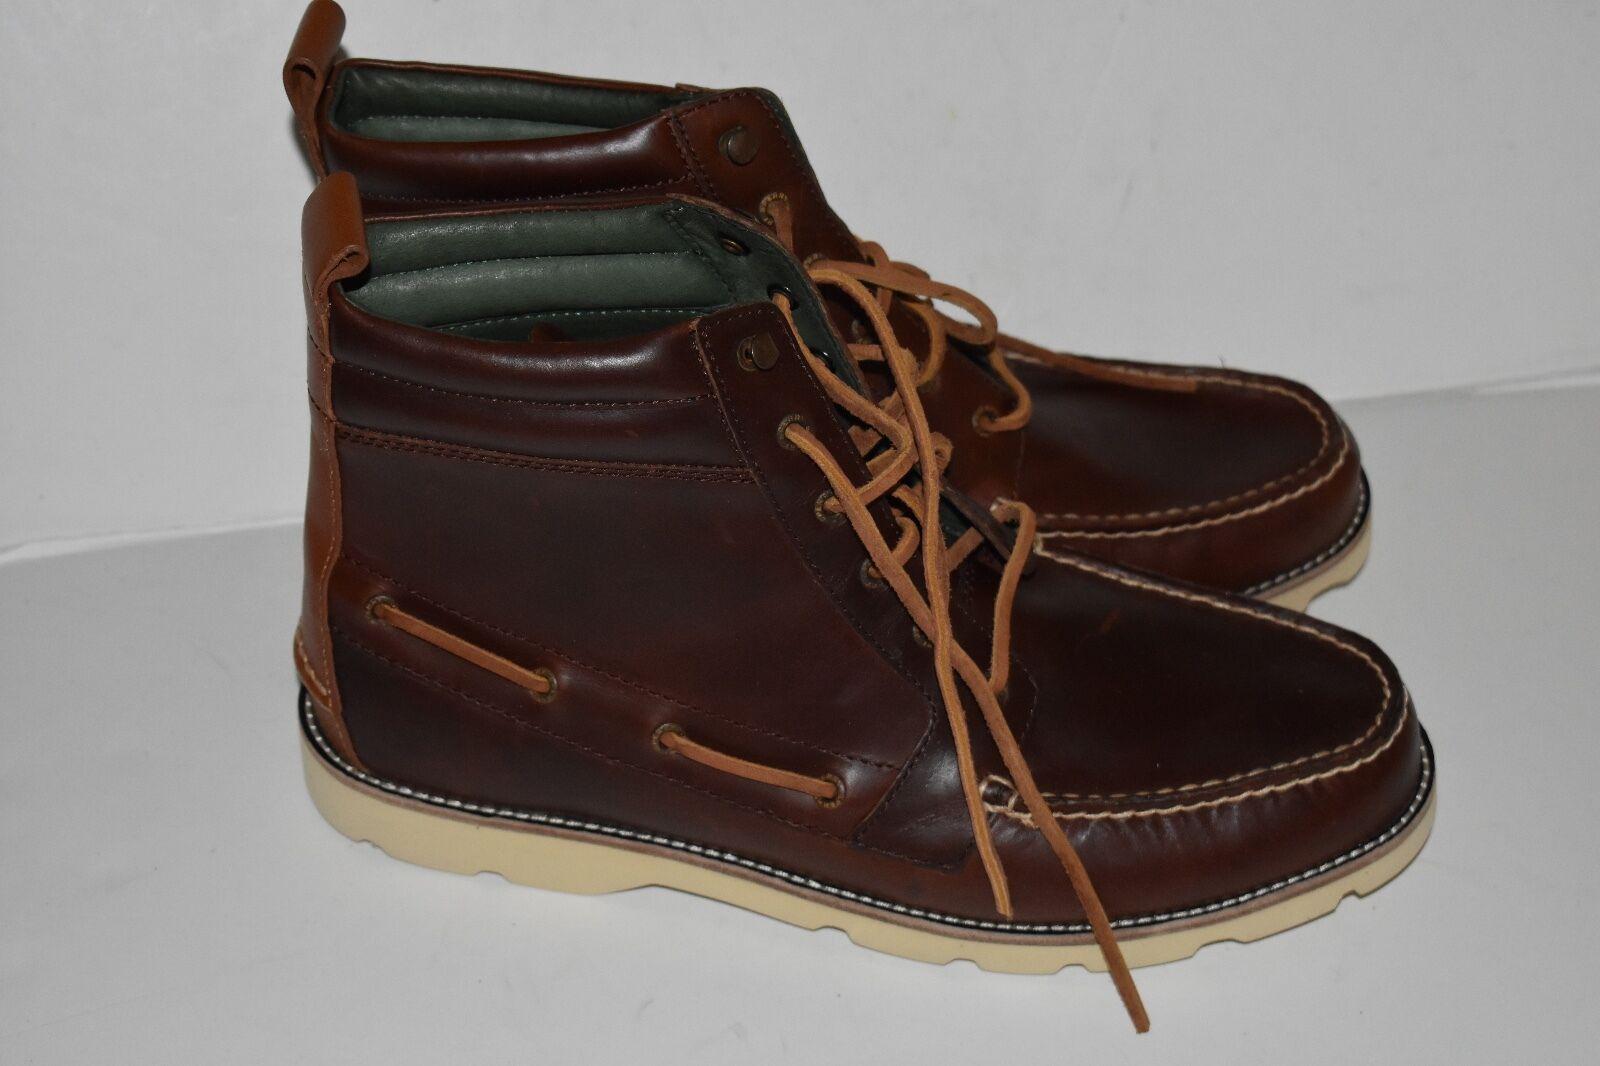 Mens Sperry Bushwick Boot DarkK Brown STS13325  Size 13M